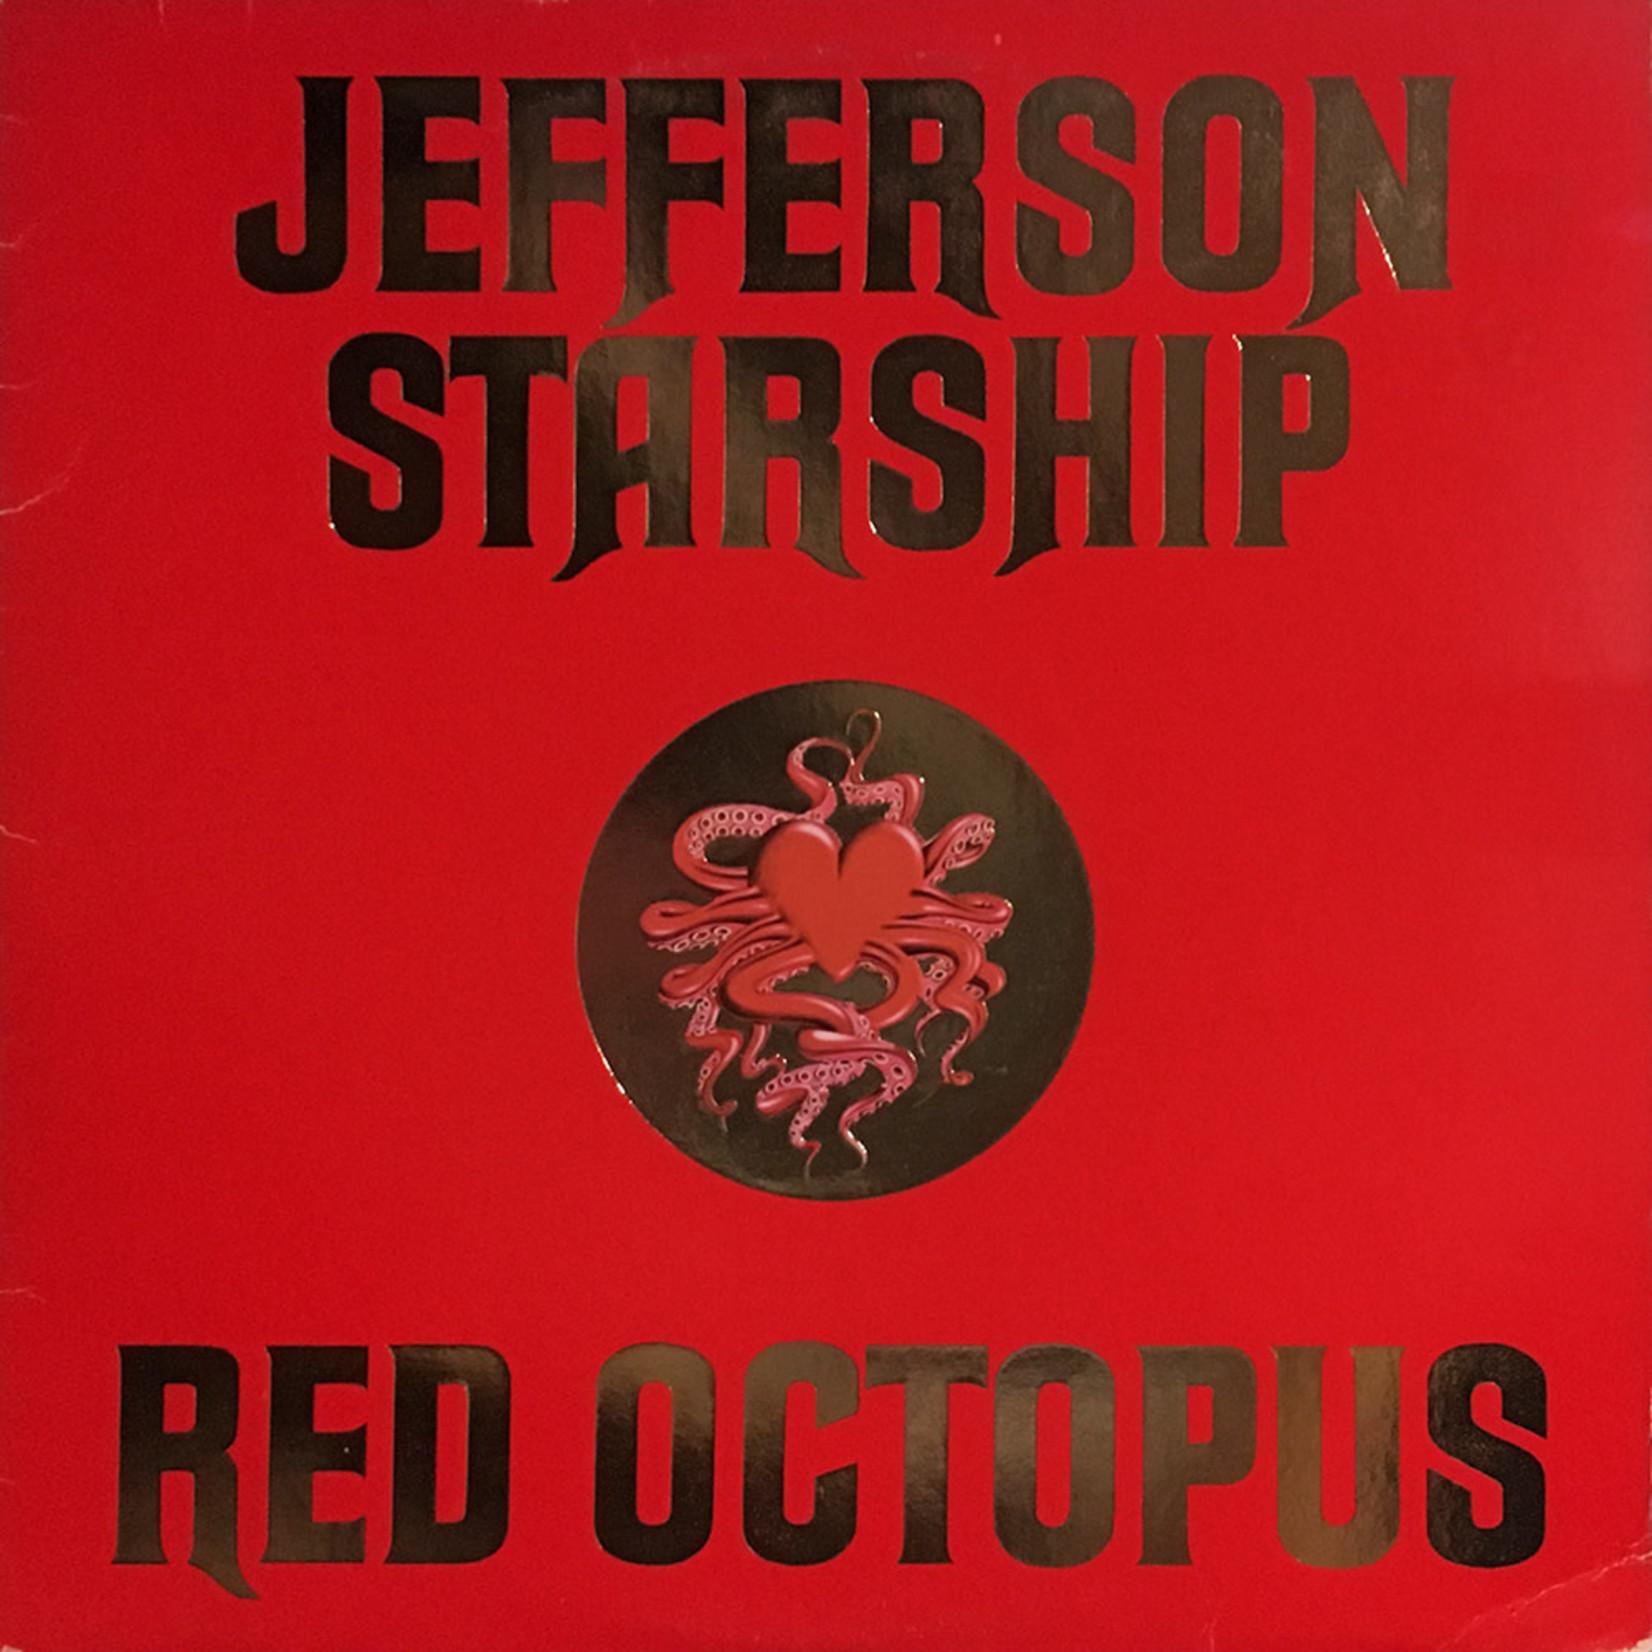 [Vintage] Jefferson Starship: Red Octopus